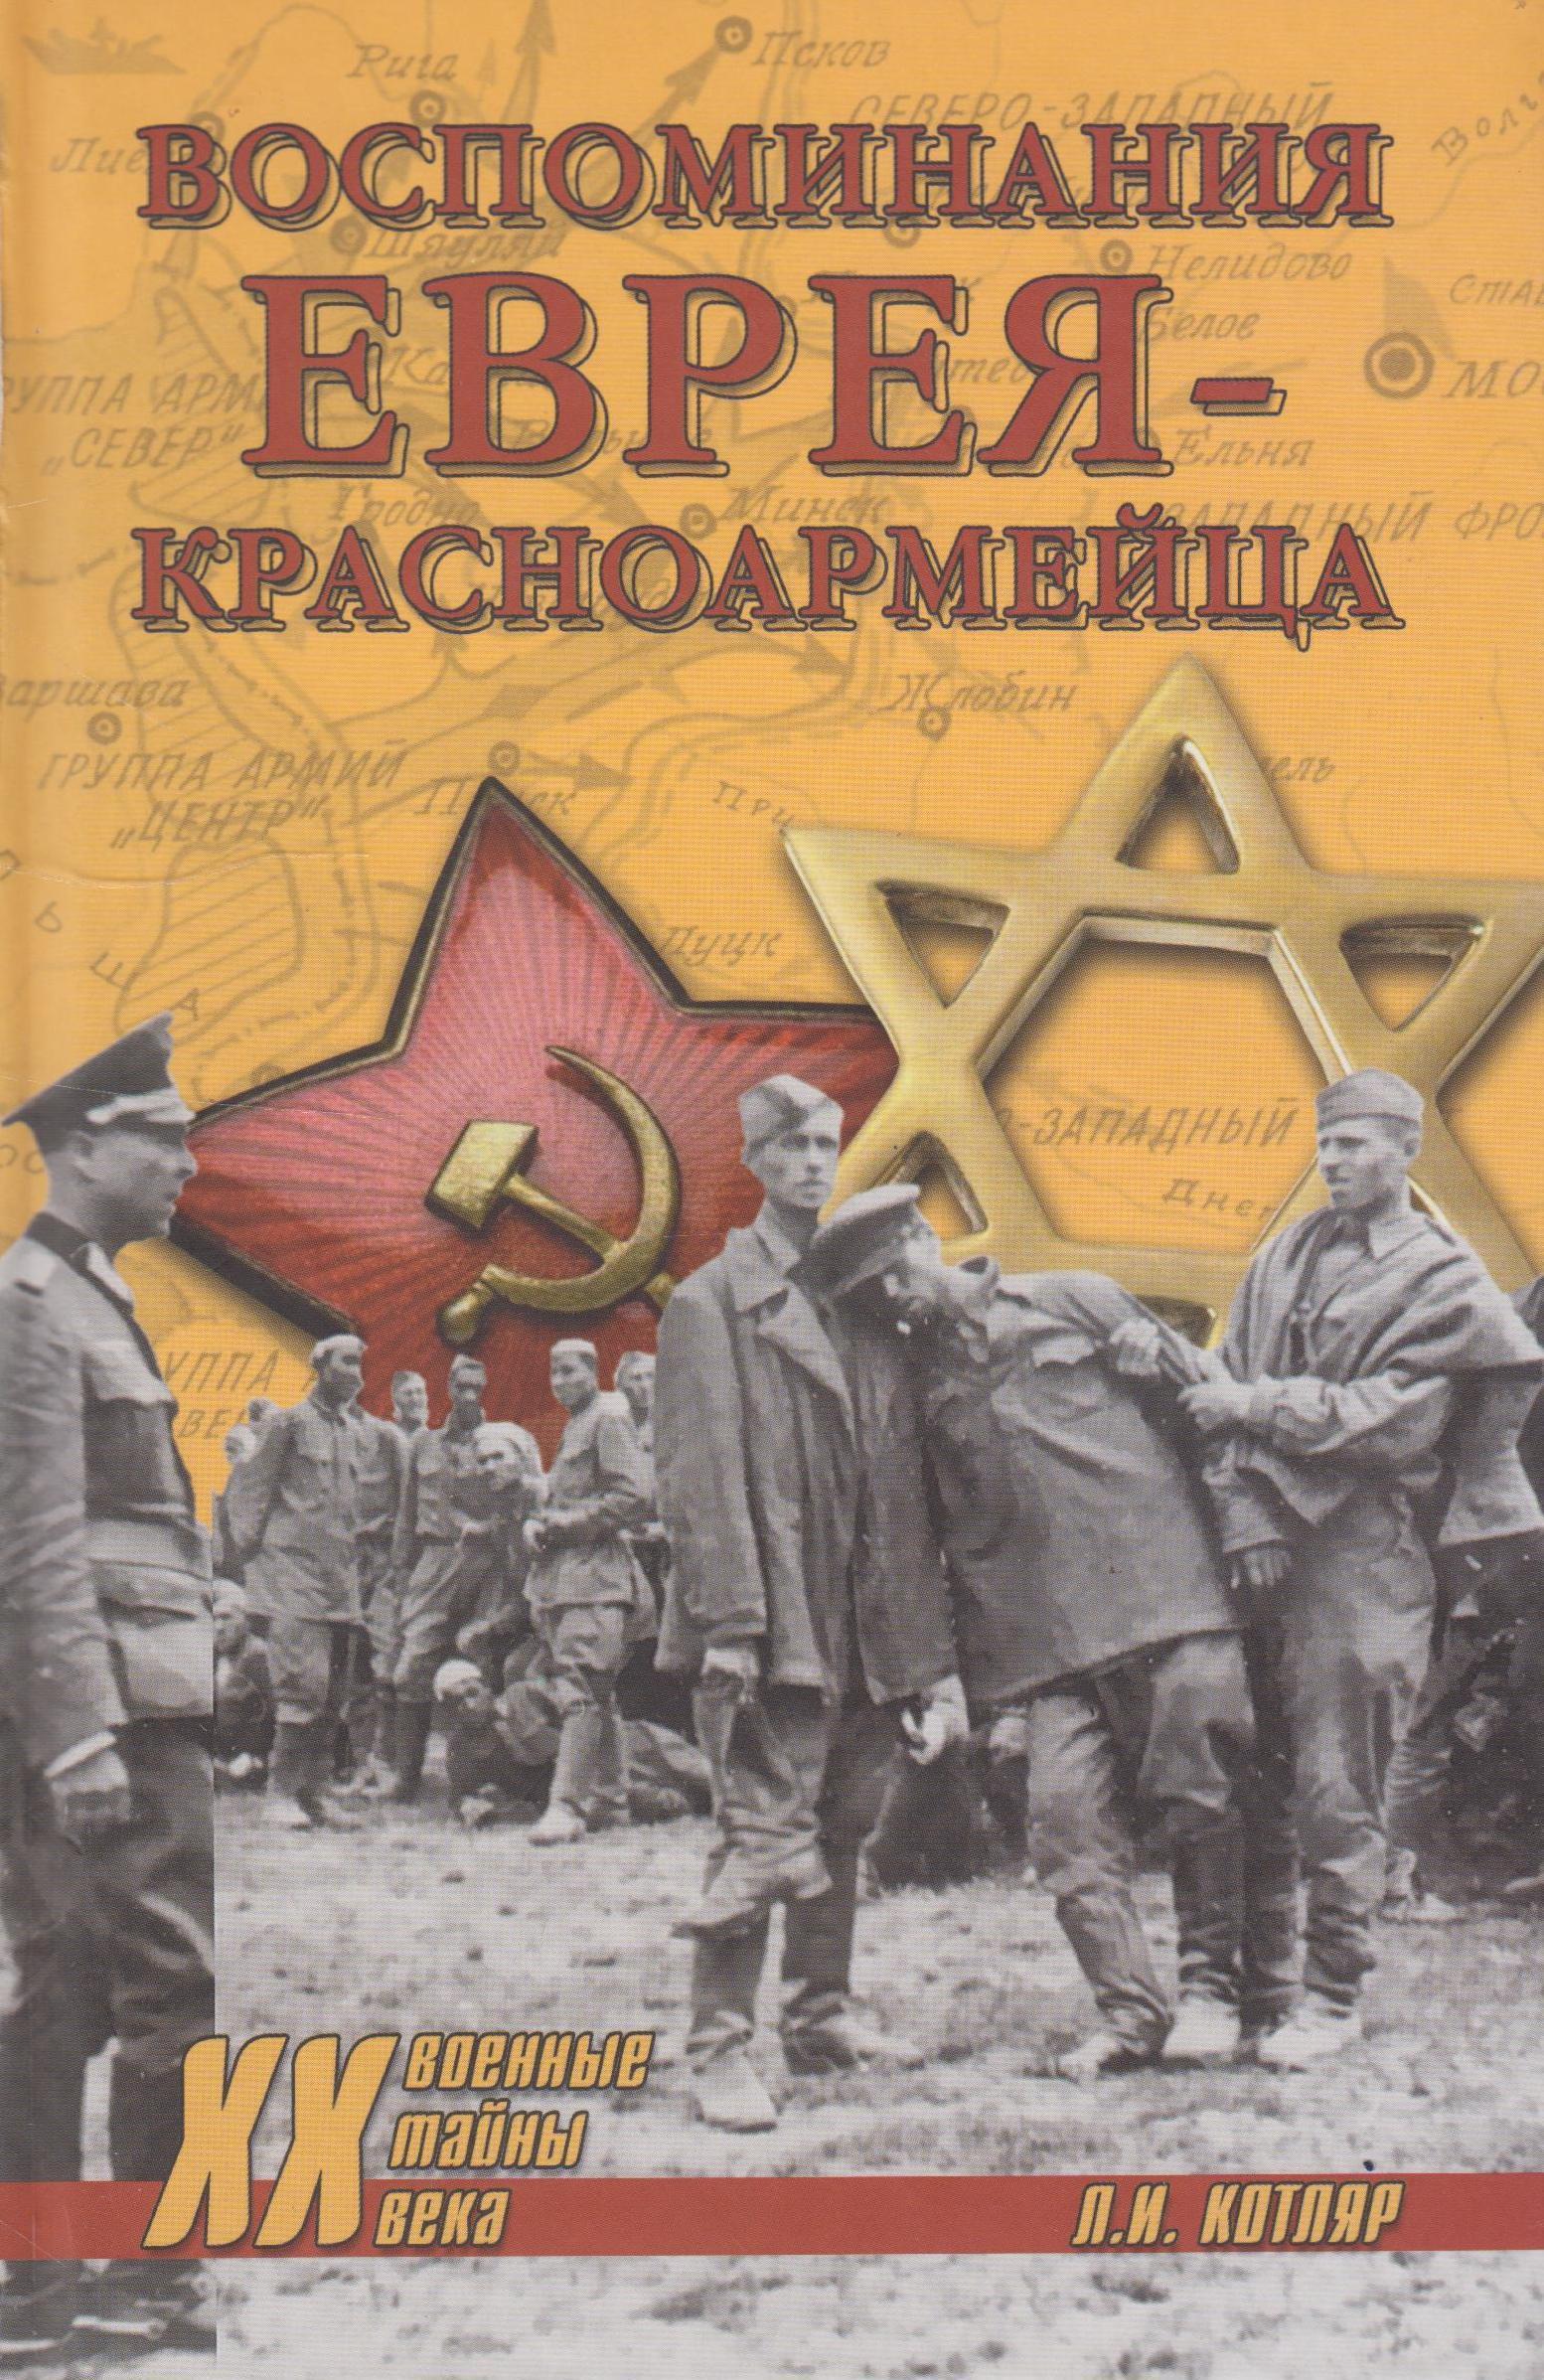 Котляр Леонид Исаакович Воспоминания еврея-красноармейца